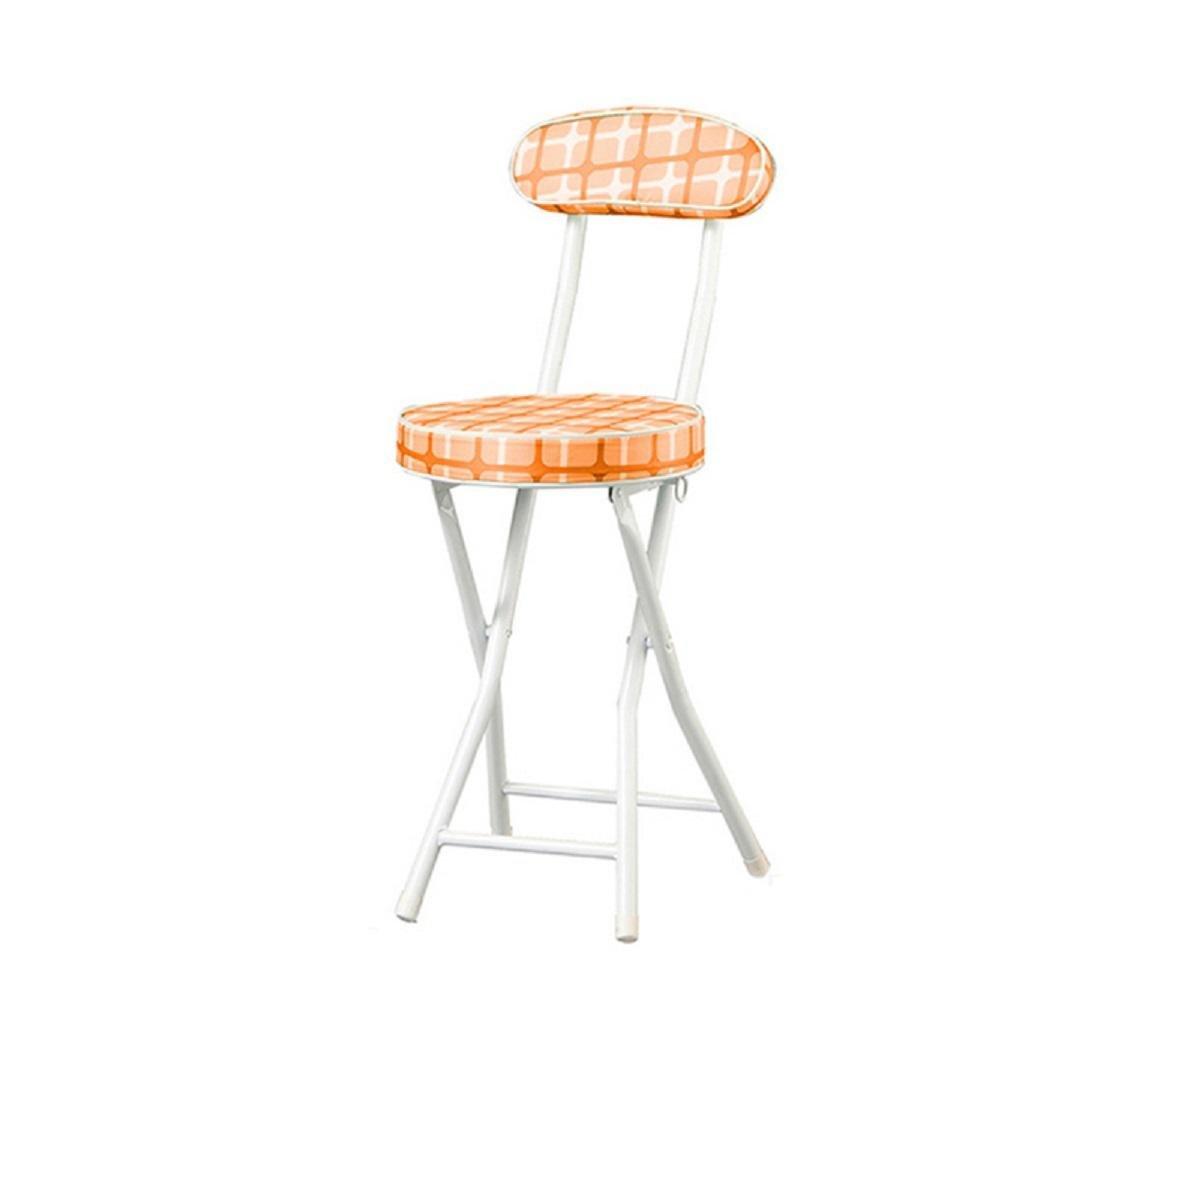 GAOJIAN Home Chair Modern Backrest Chair Stool Metal Portable Folding Computer Chair Maximum Weighing 90 Kg , a